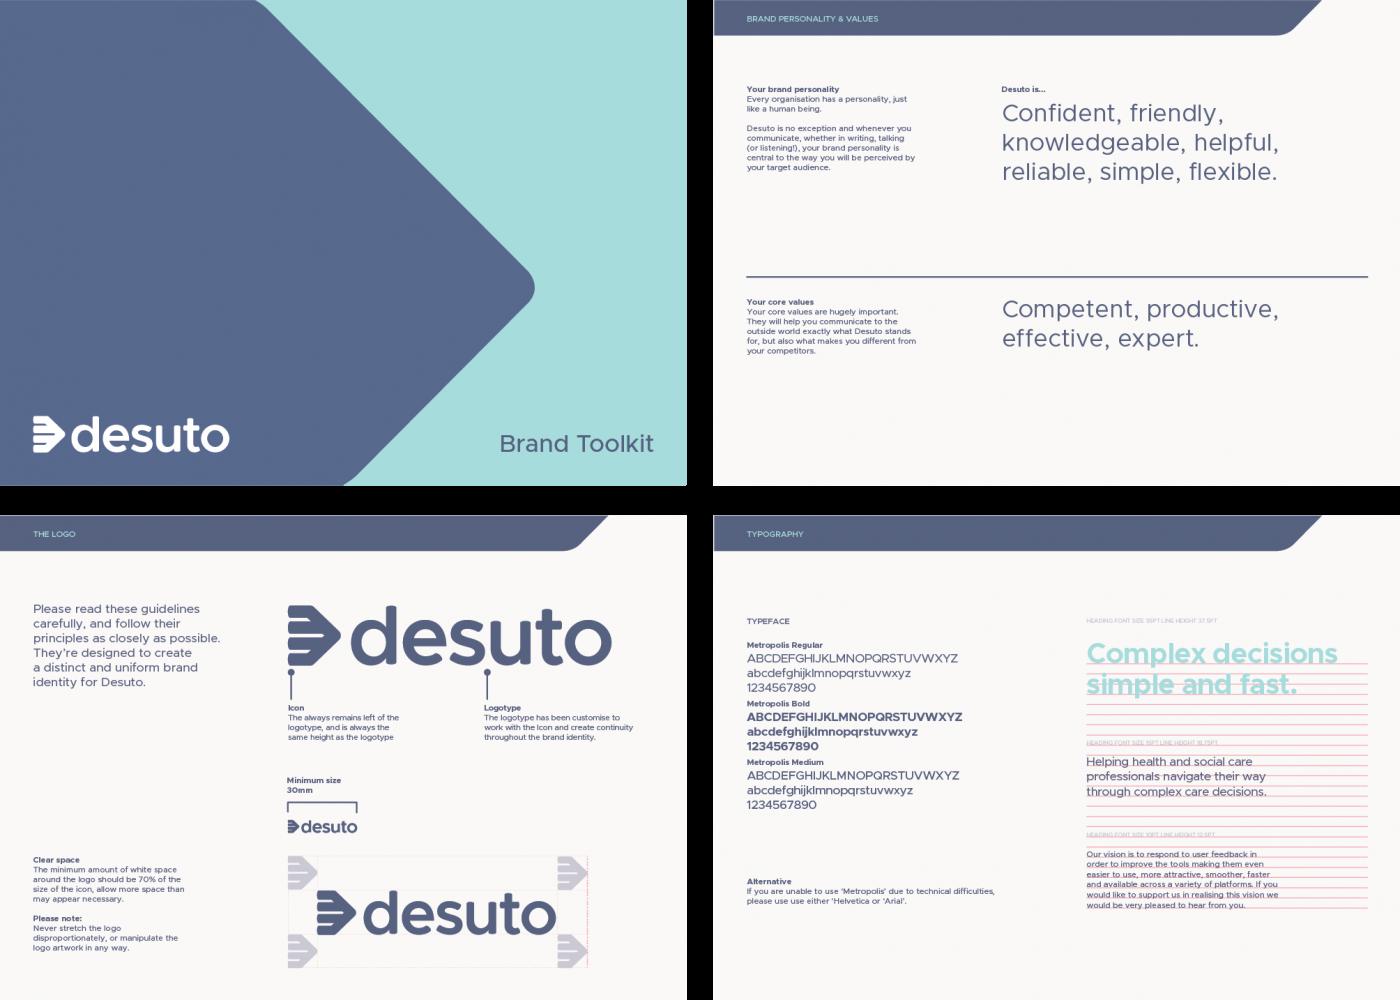 desuto-04